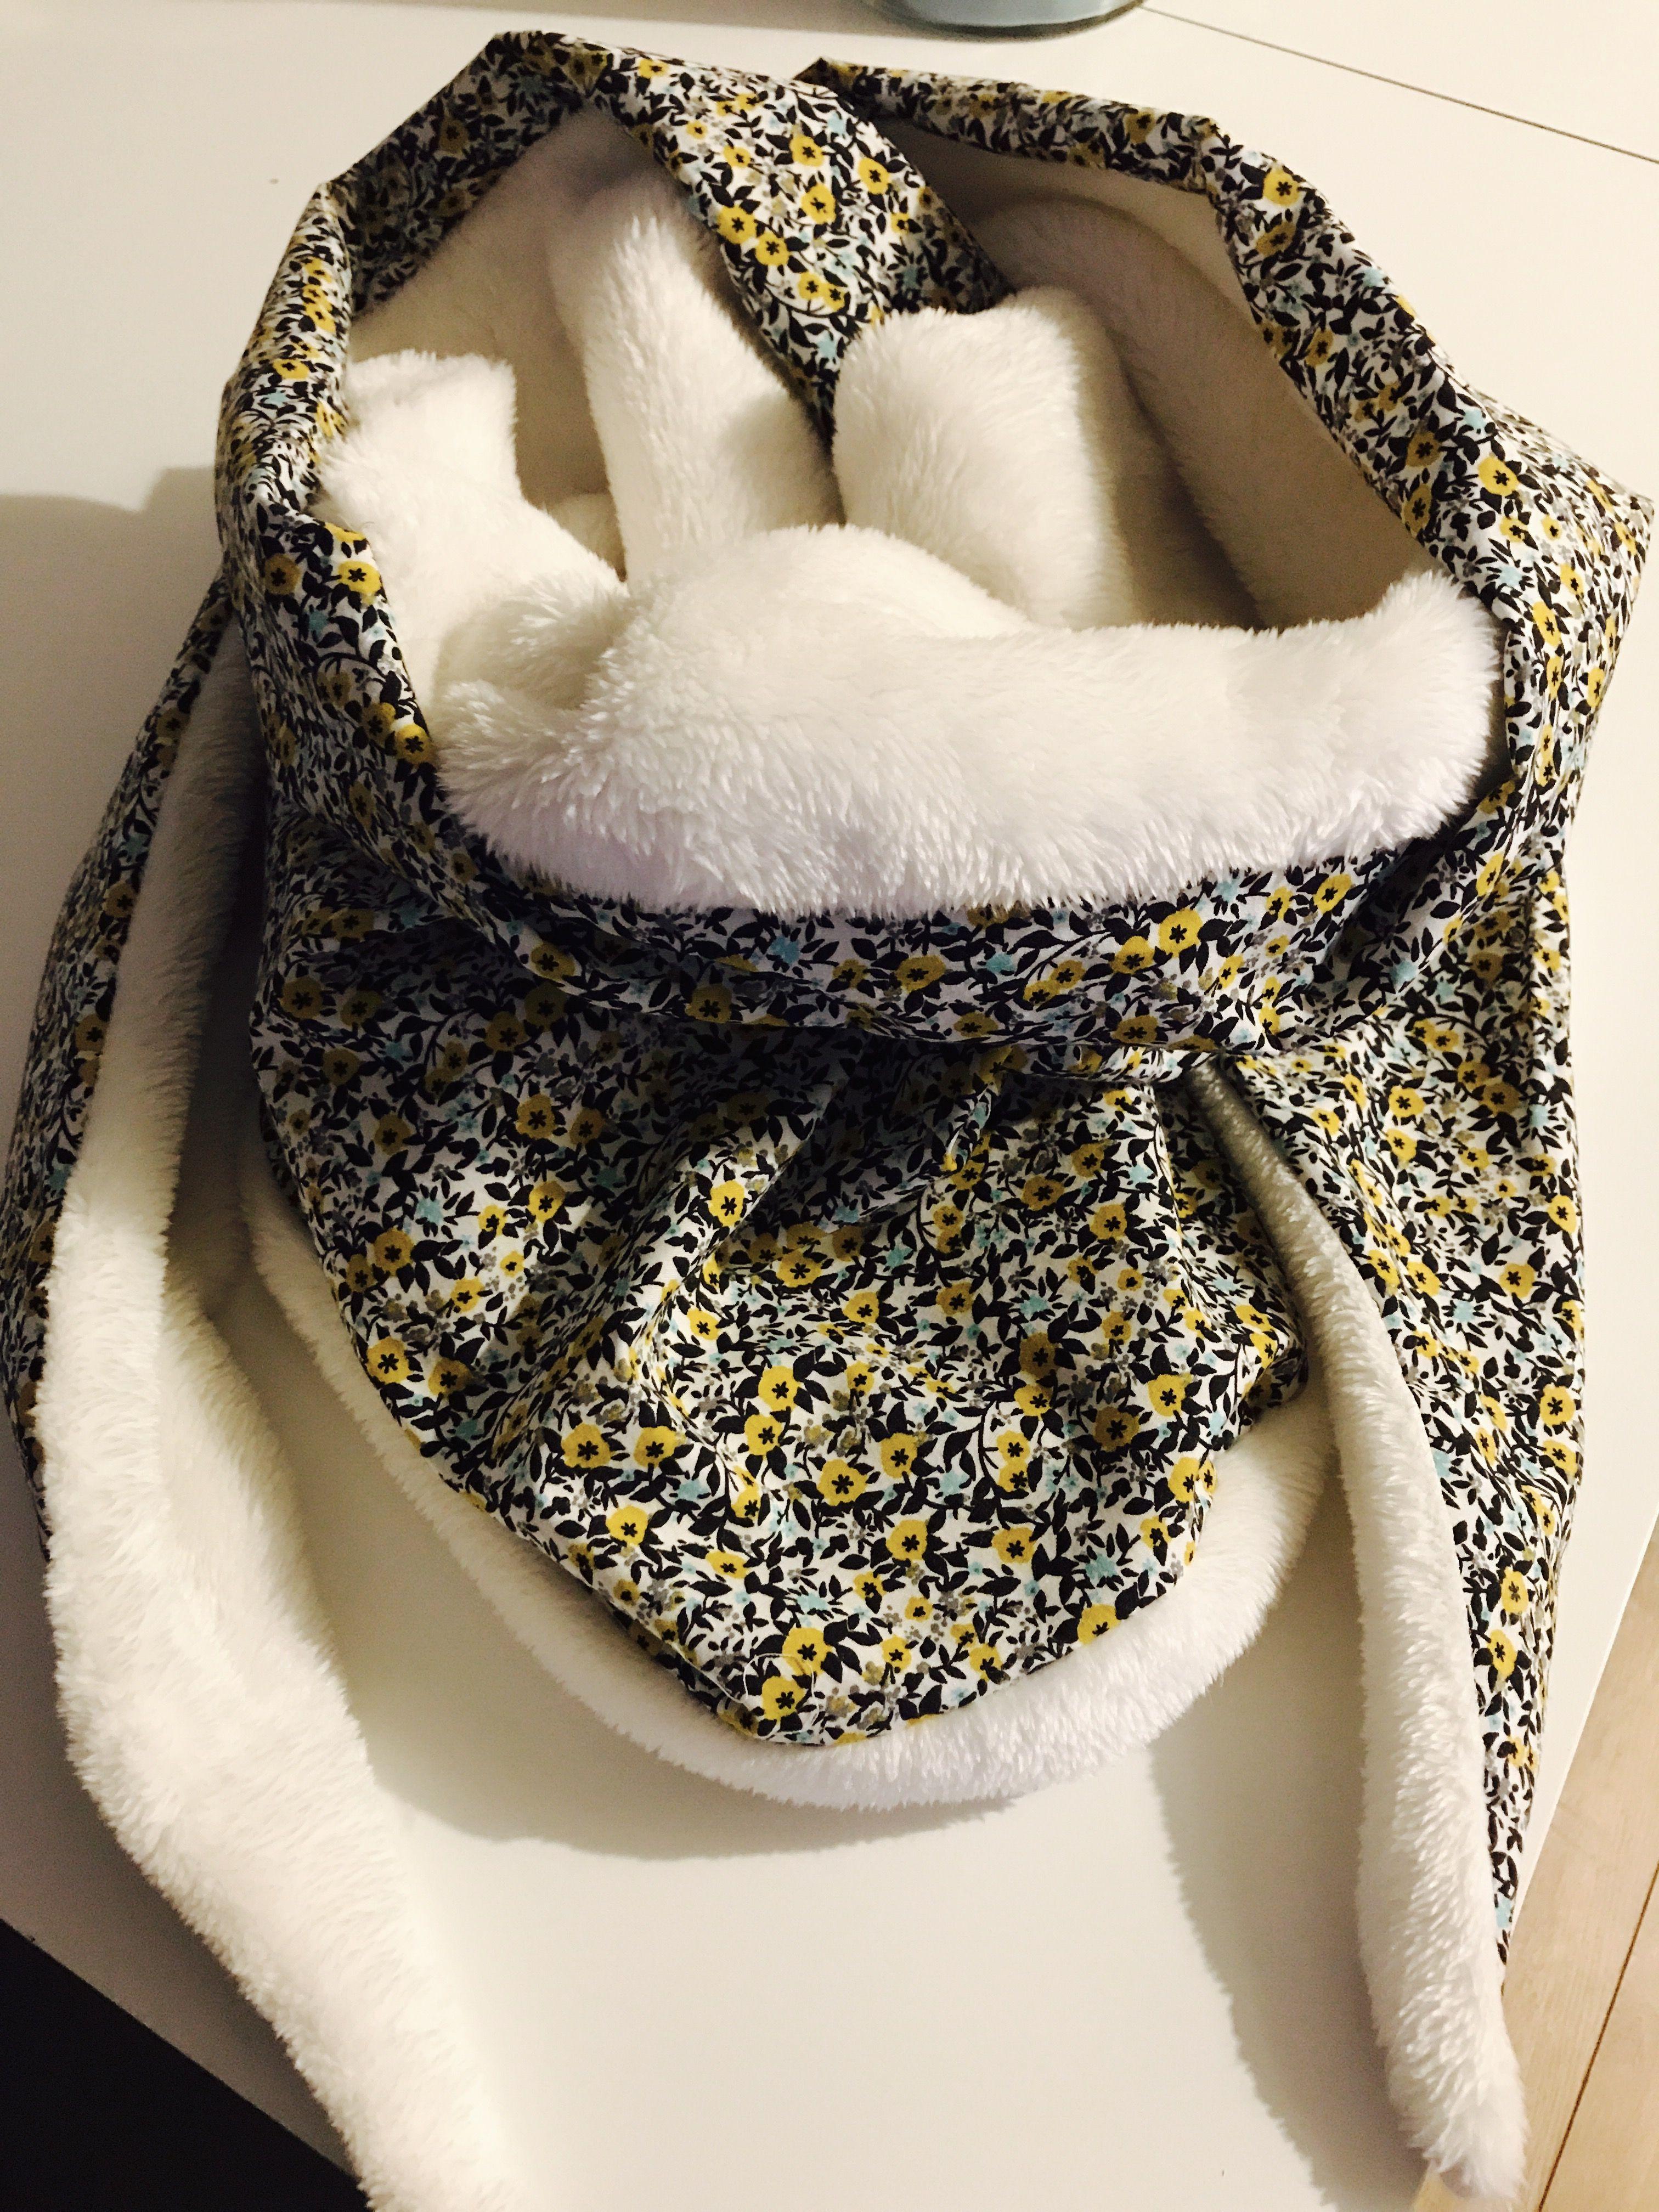 ch che d 39 hiver cousu main avec tissu doudou scarf pinterest couture tissu et cousu main. Black Bedroom Furniture Sets. Home Design Ideas